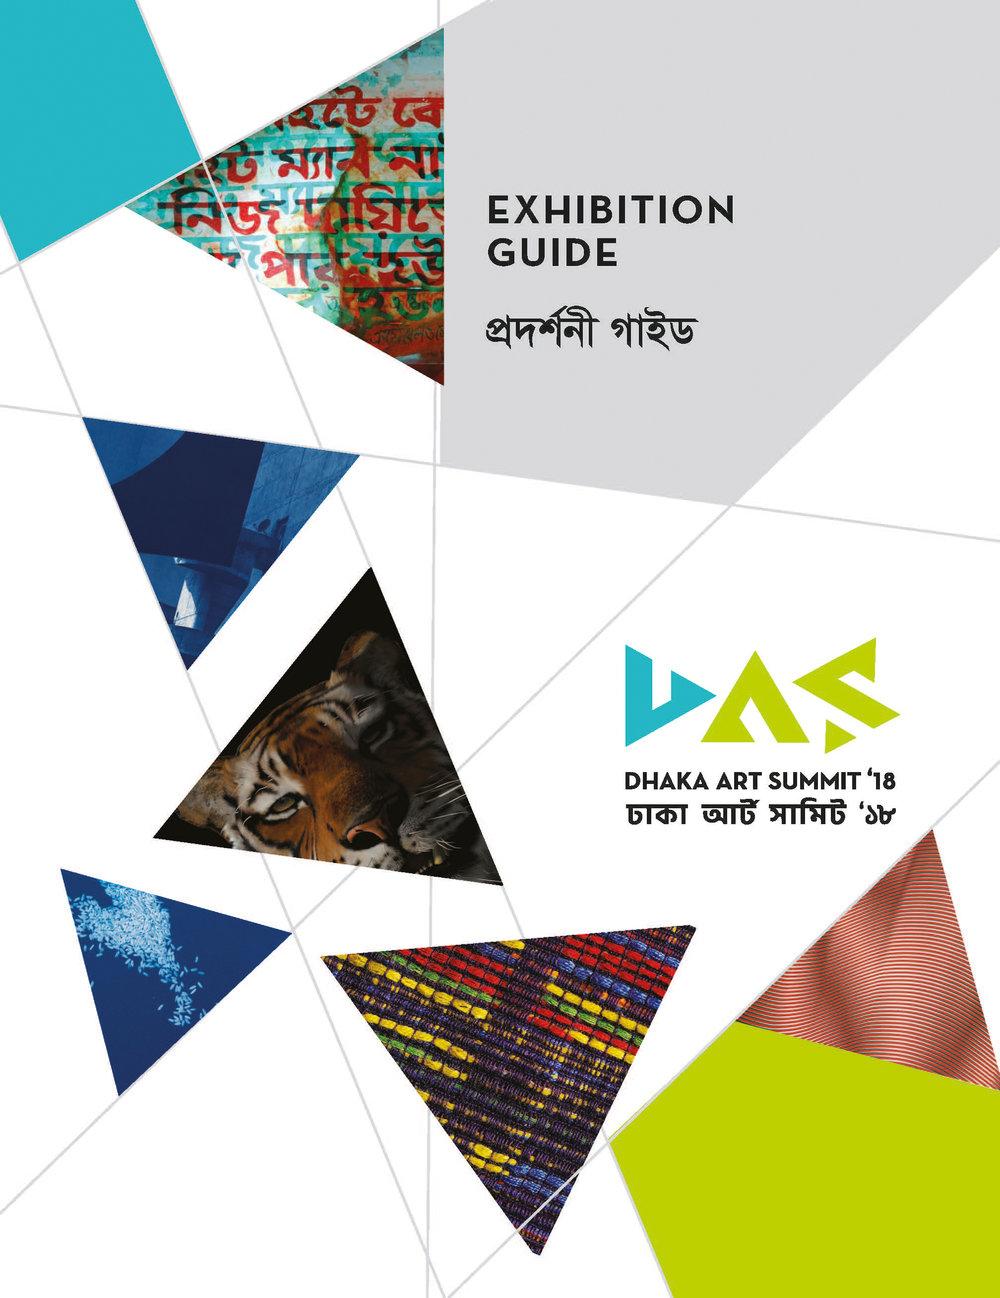 DAS 2018 Exhibition Guide